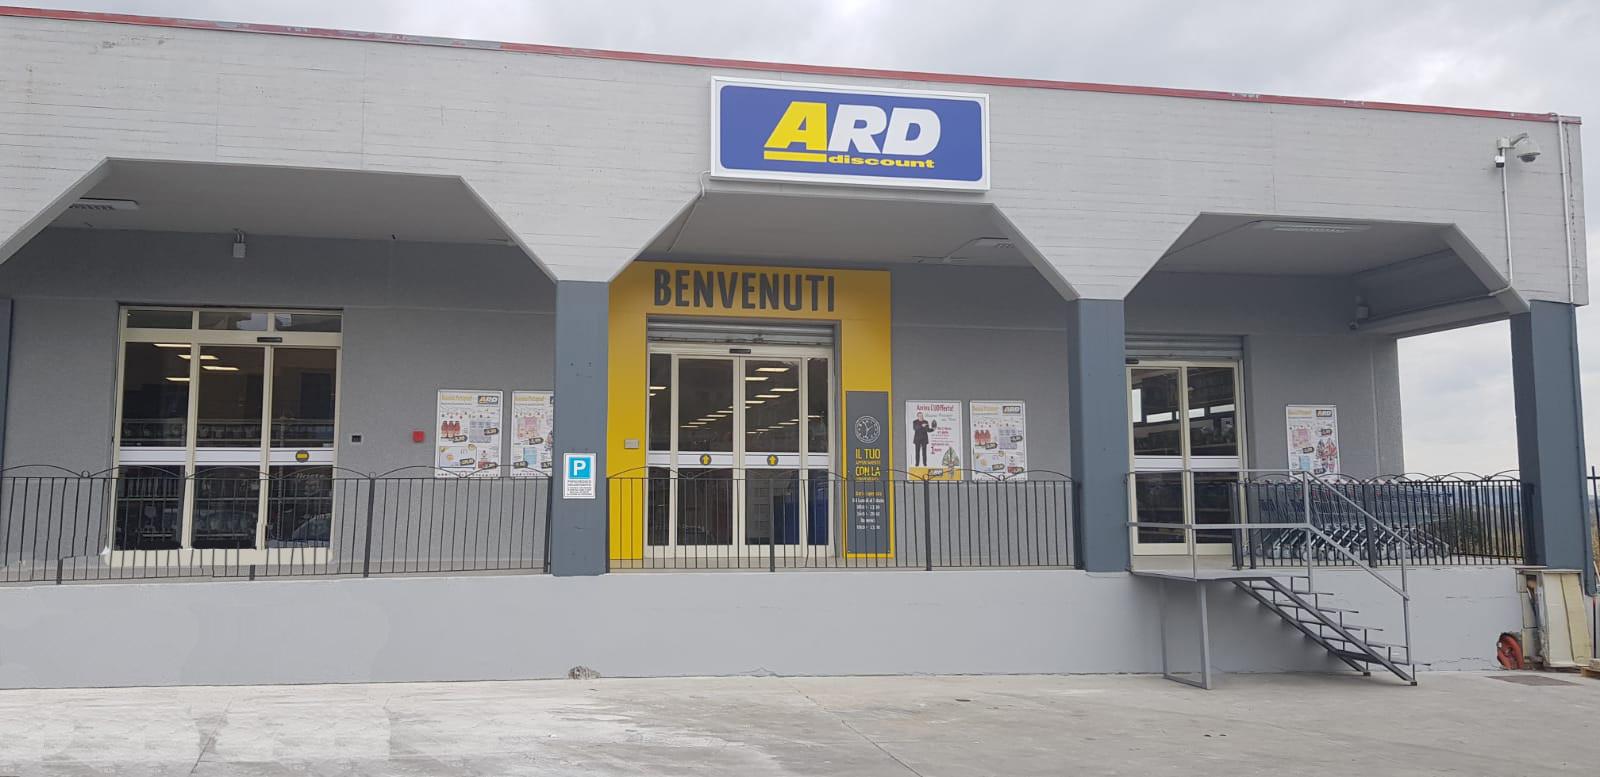 ARD Discount - ARD arriva in Basilicata